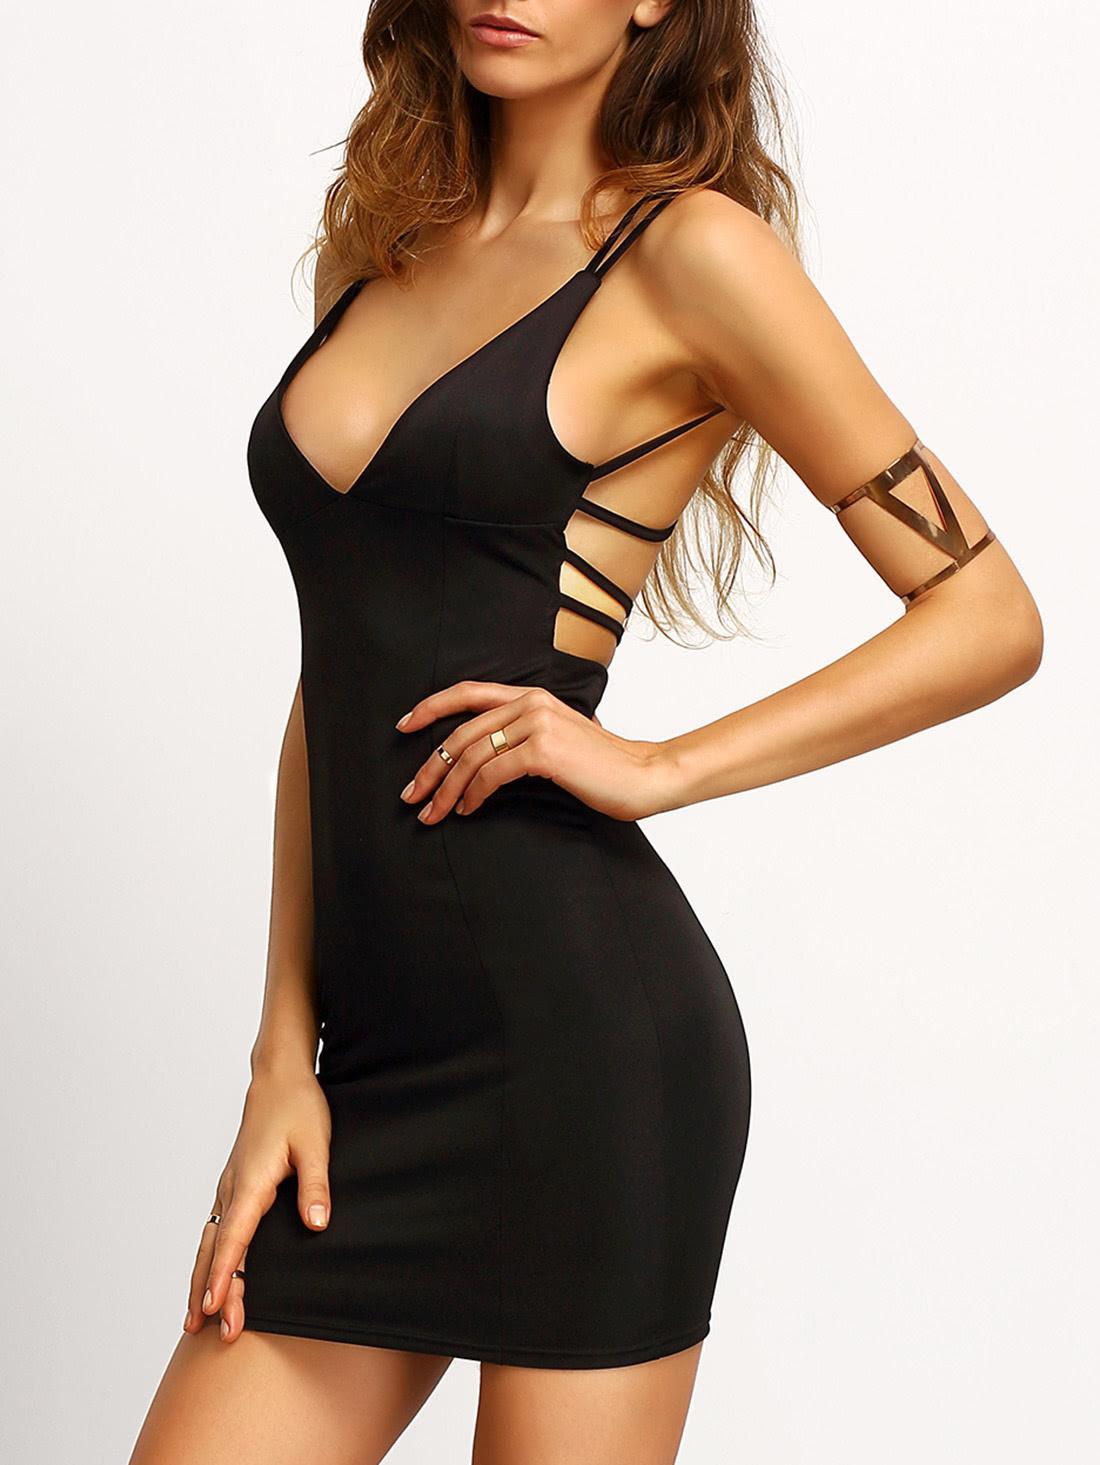 Buy bodycon dresses x ray where quote blog